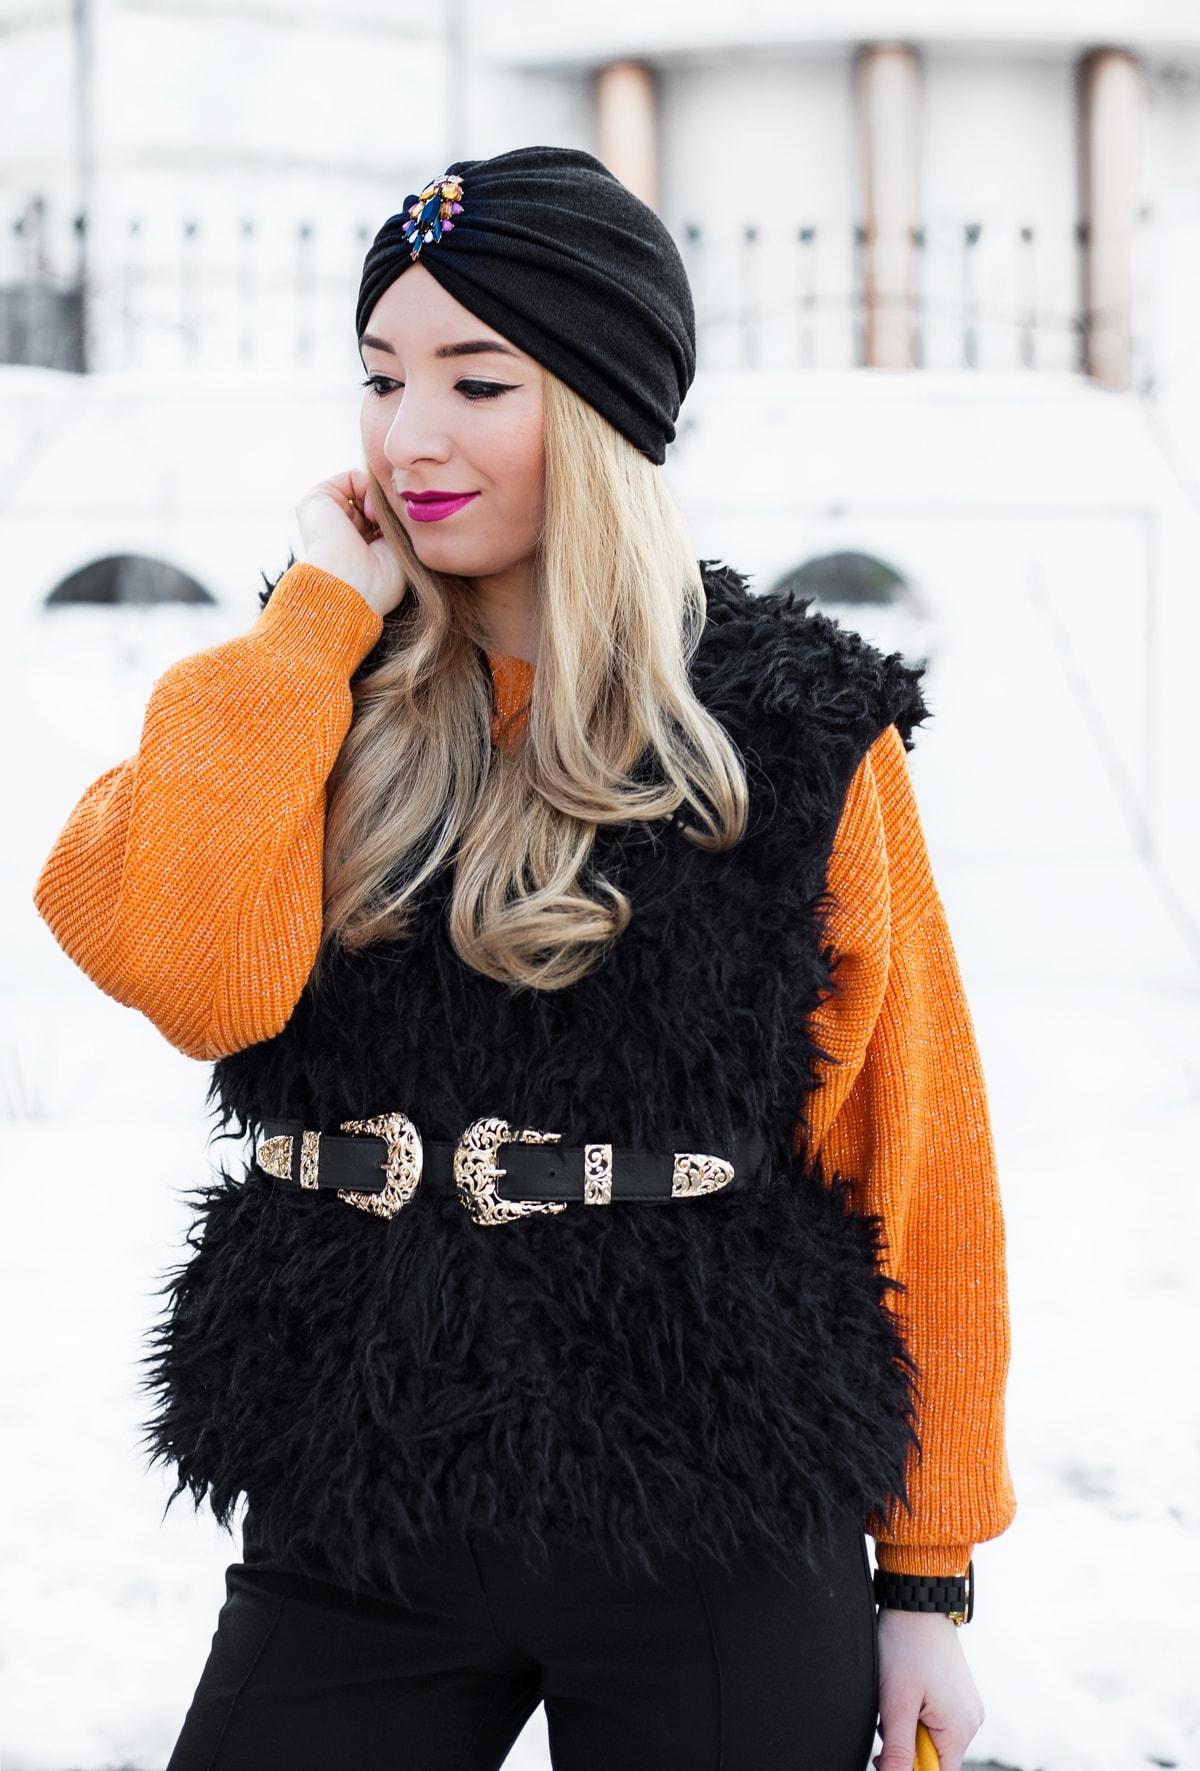 Andreea Ristea, blogger moda Mioveni, Arges (Pitesti)